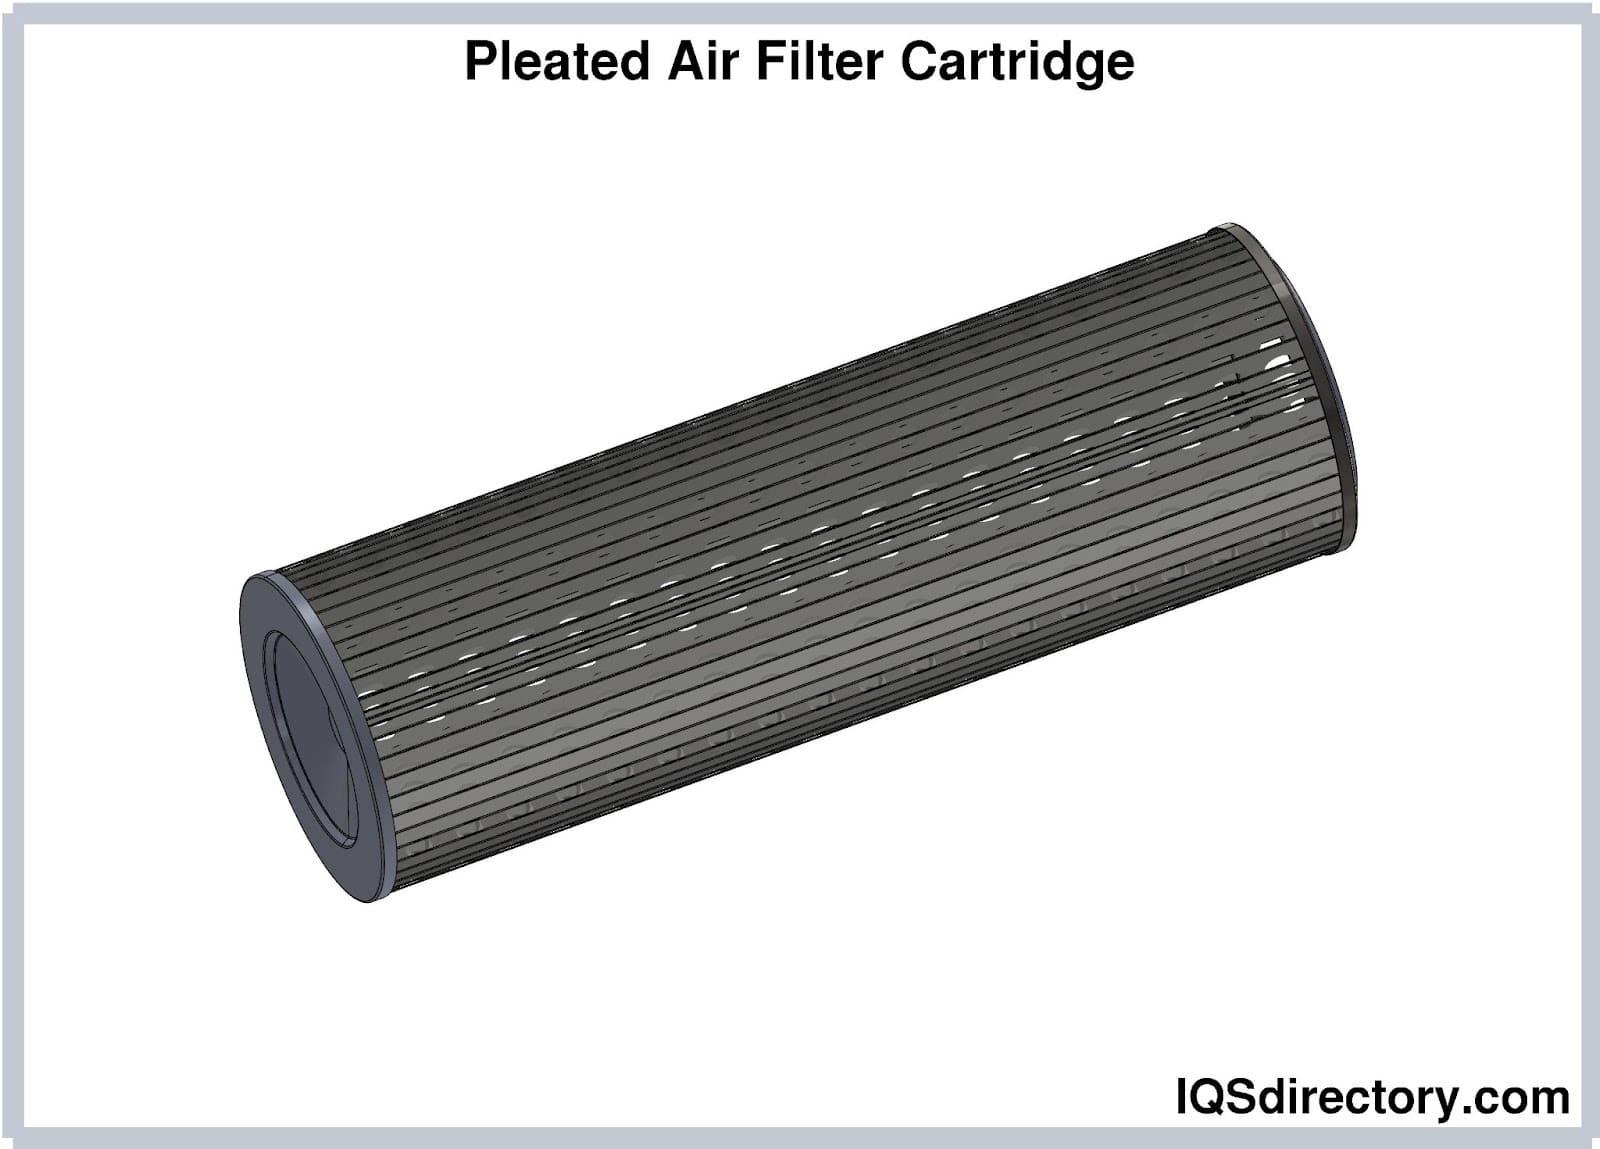 Pleated Air Filter Cartridge